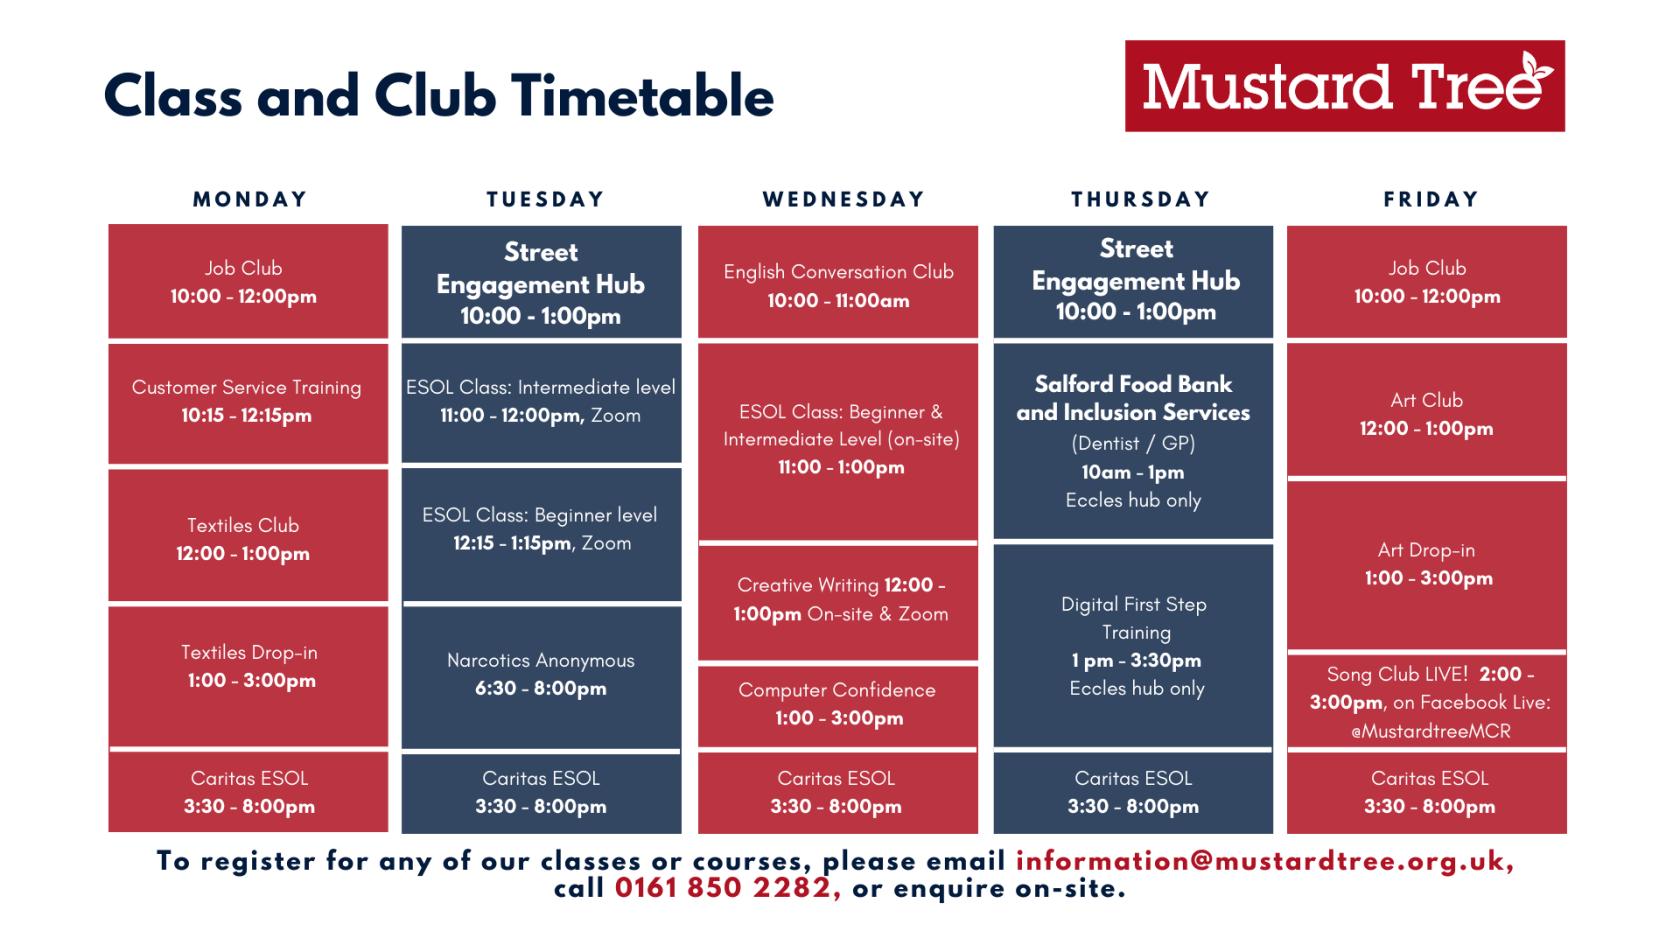 Copy of Class & Club Timetable V4.5